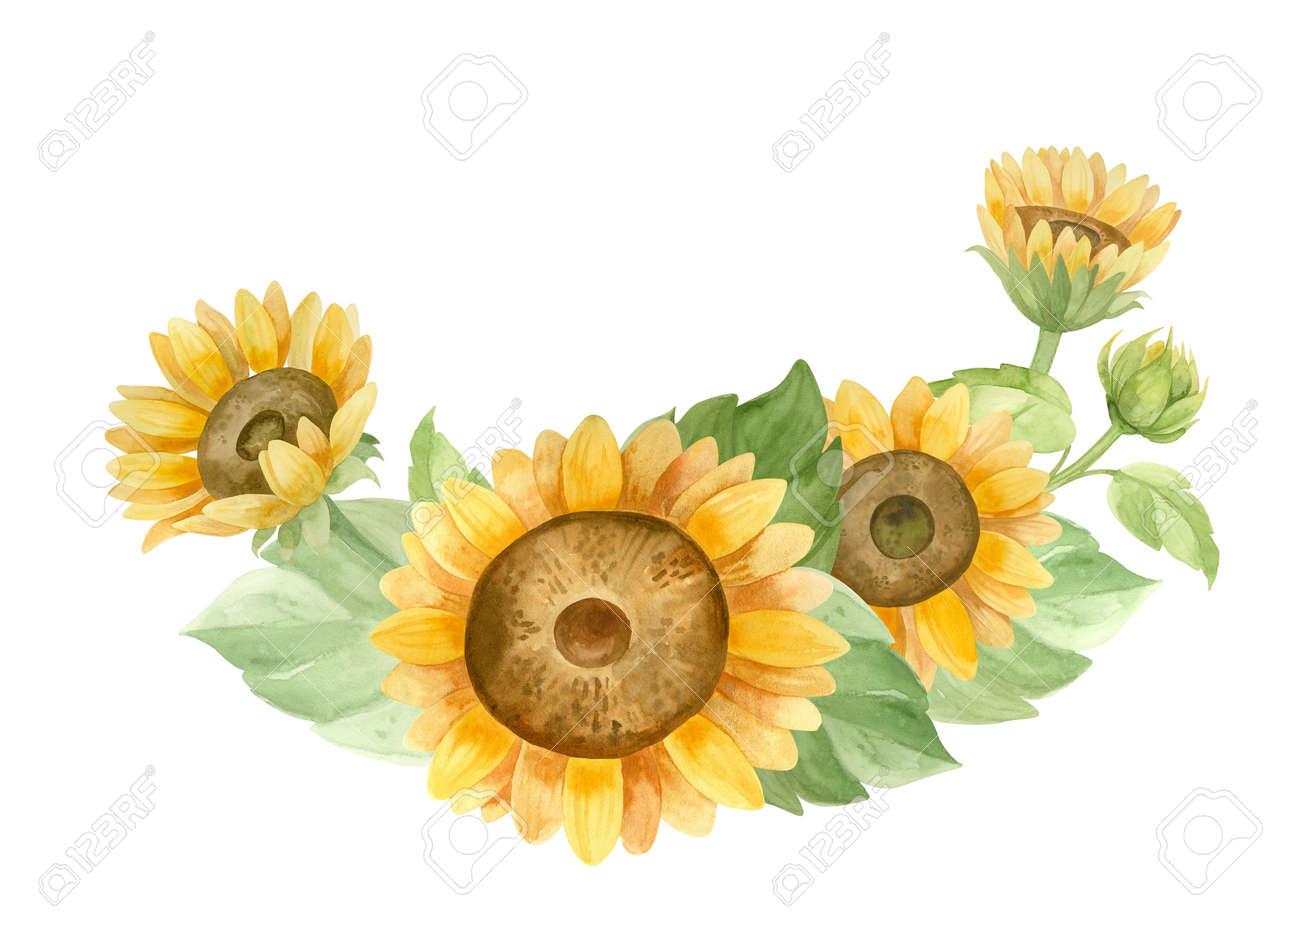 Sunflowers, flower arrangement for Sunflower products, Harvest Festival, Thanksgiving Day. - 172376130